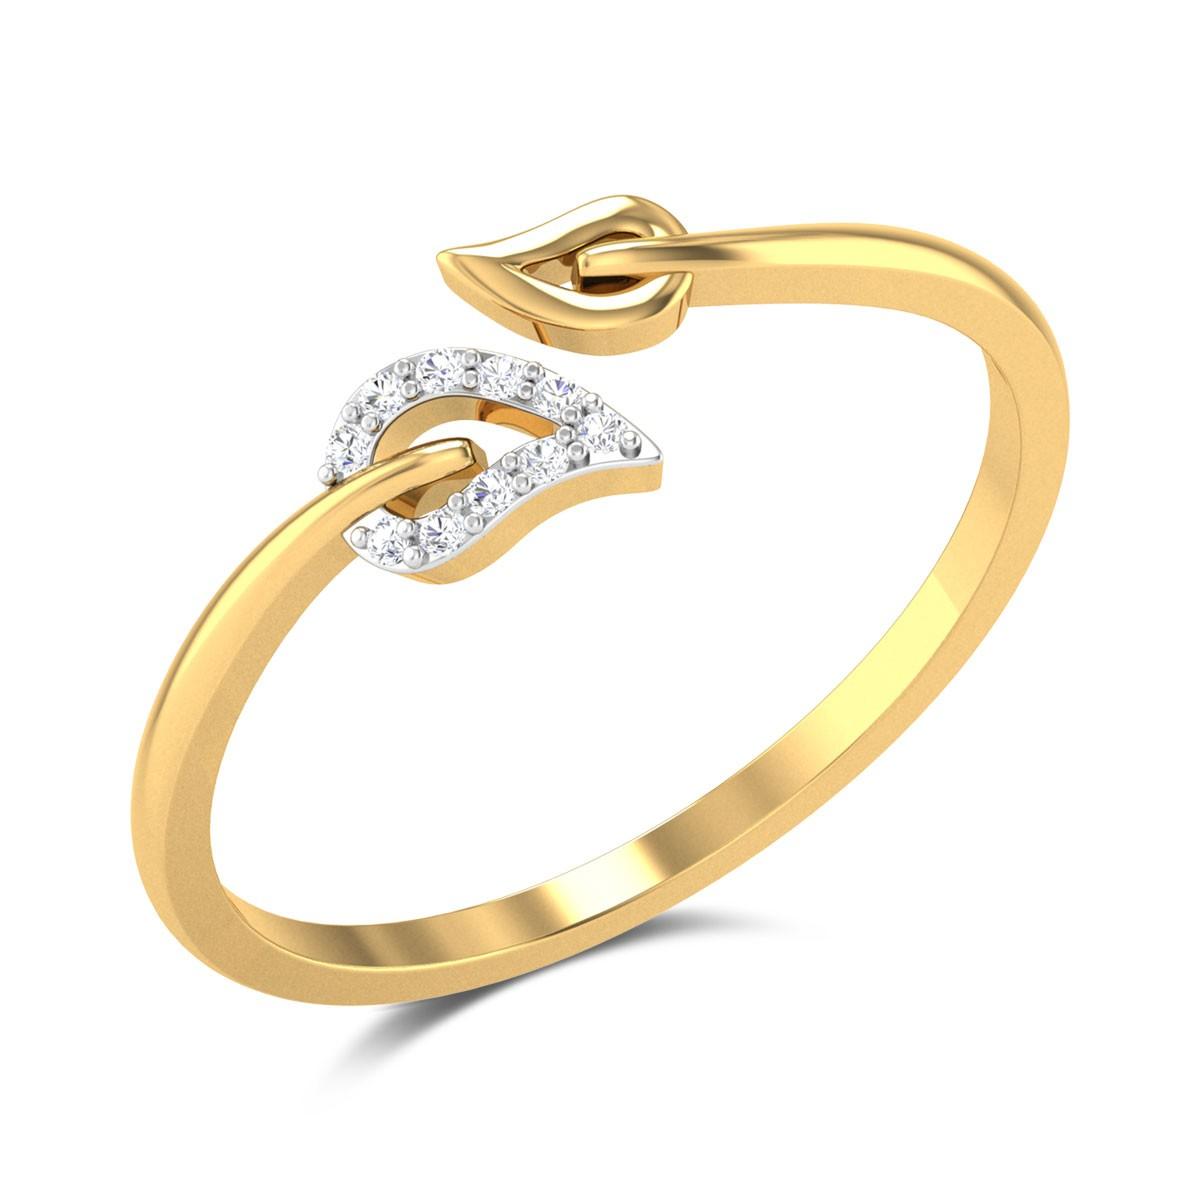 Halden Leafy Diamond Ring